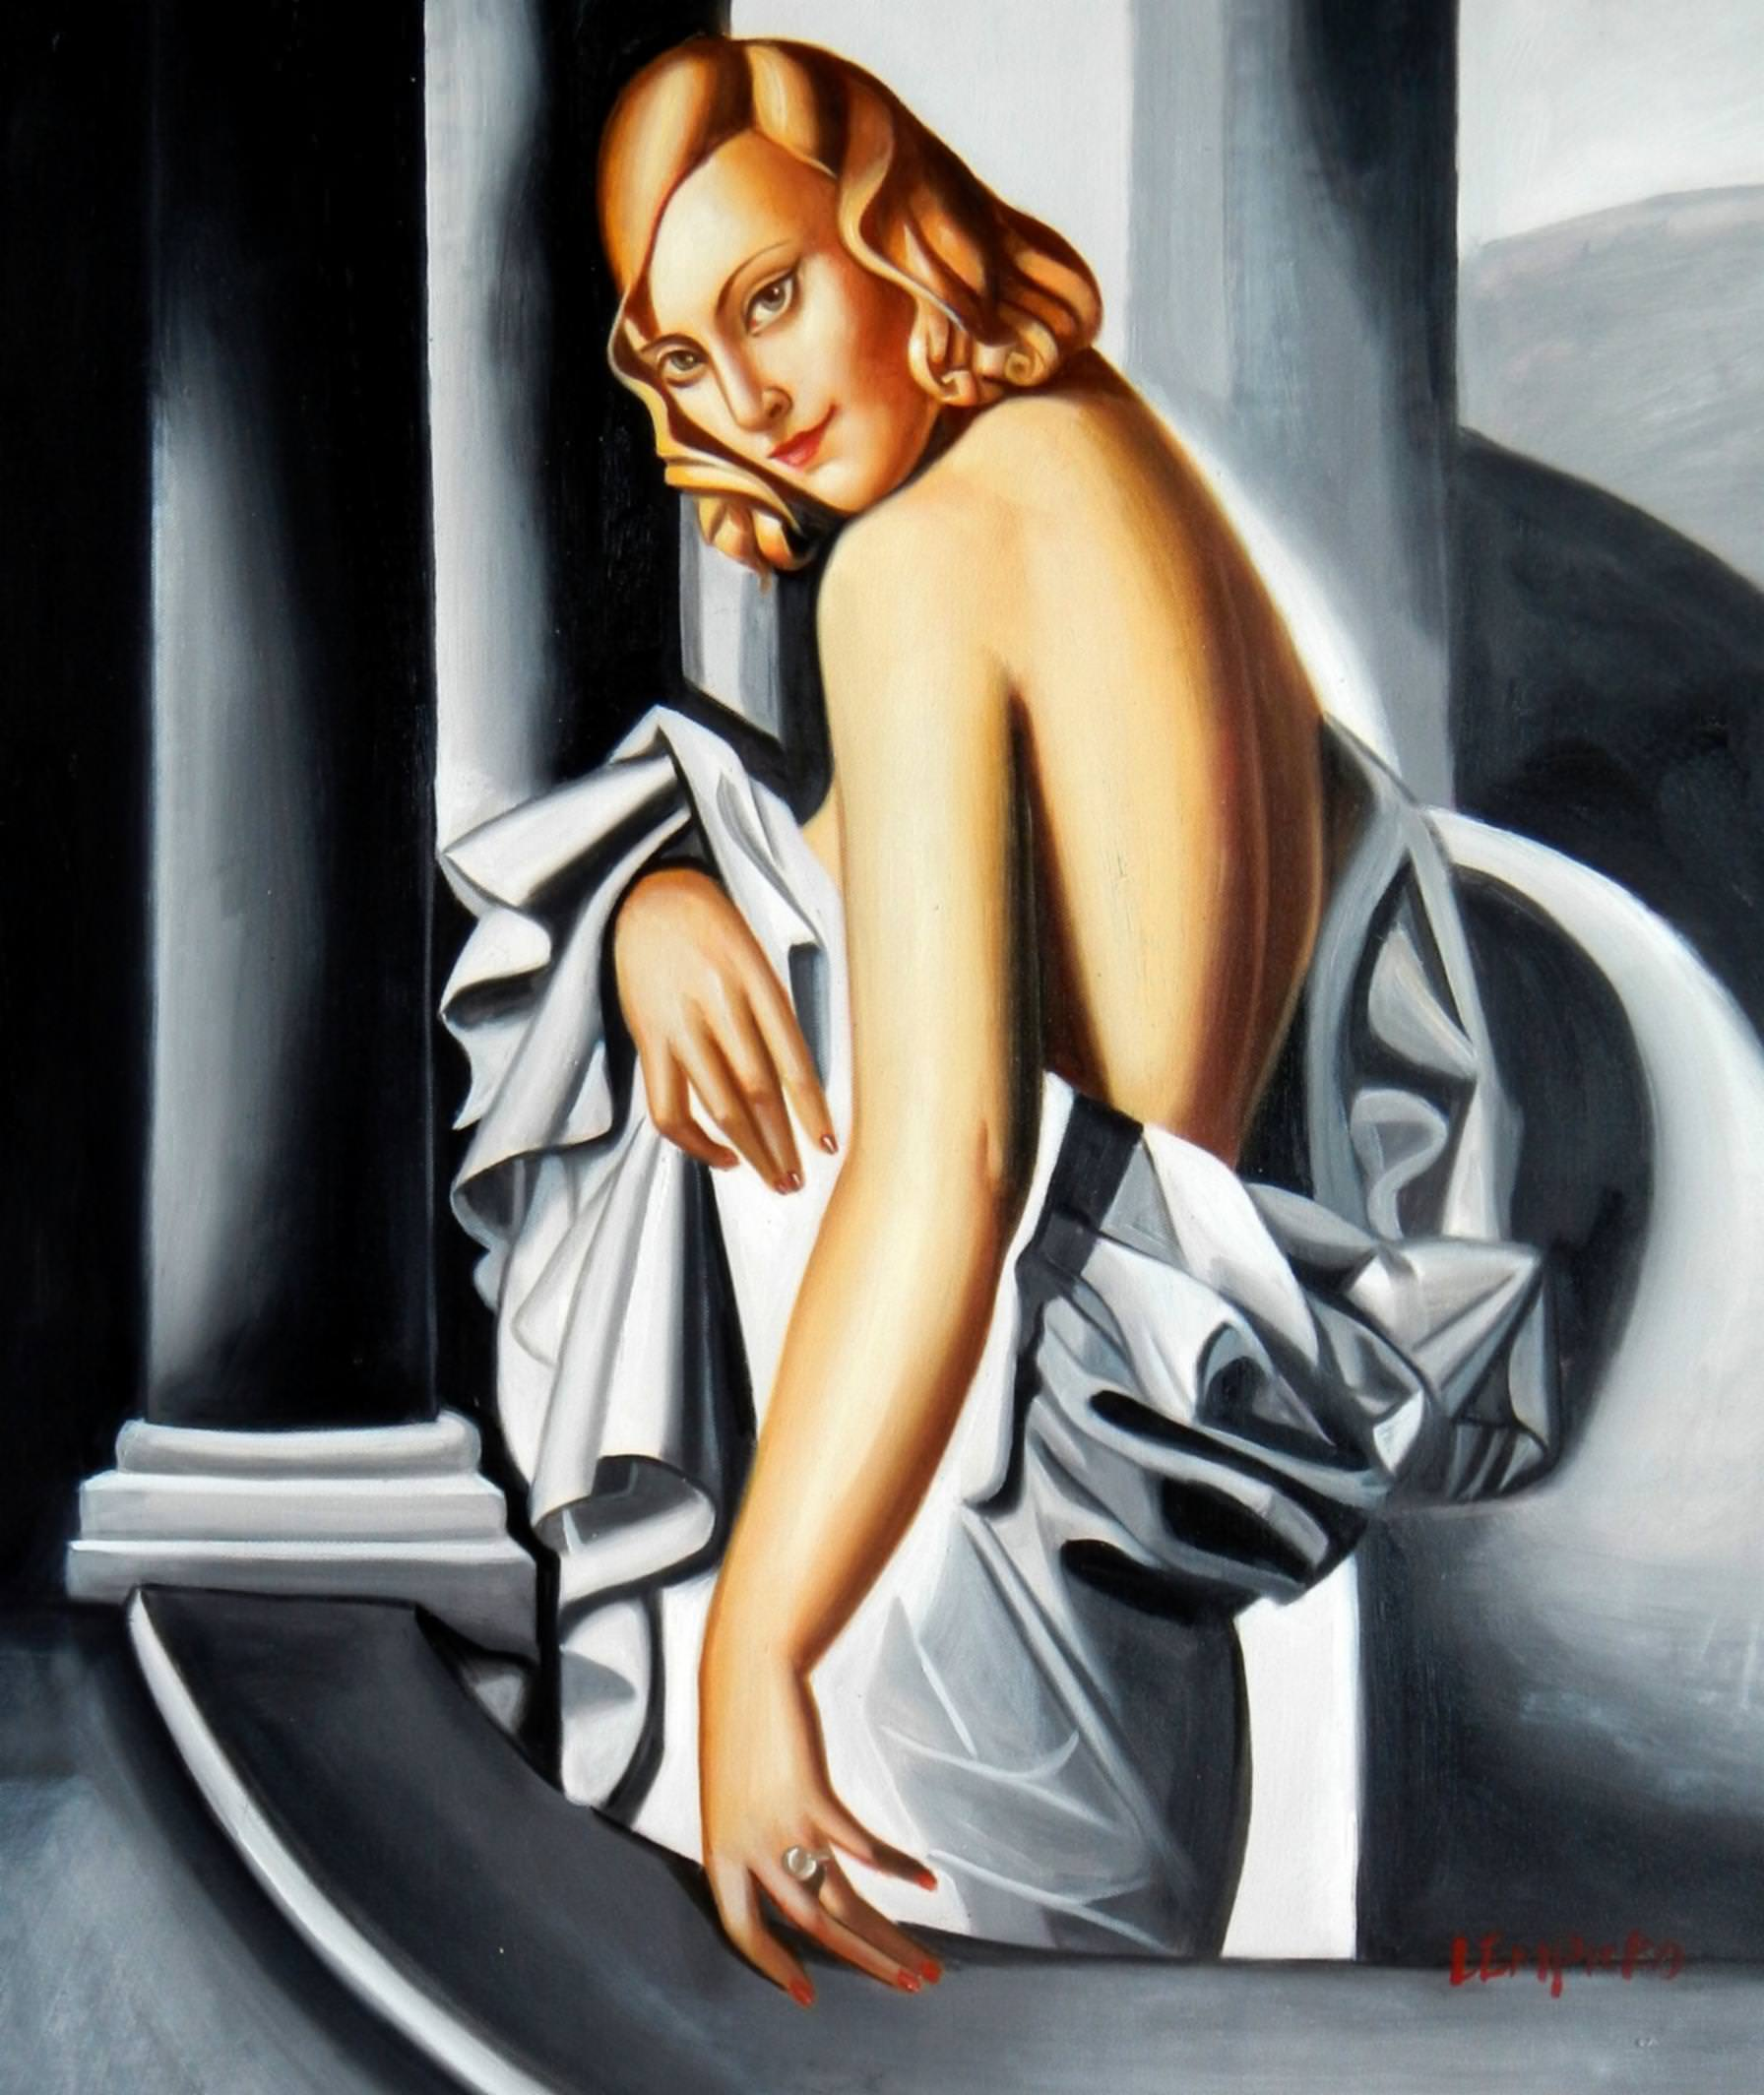 Homage of T. de Lempicka - Portrait der Marjorie Ferry c92864 50x60cm Ölbild handgemalt